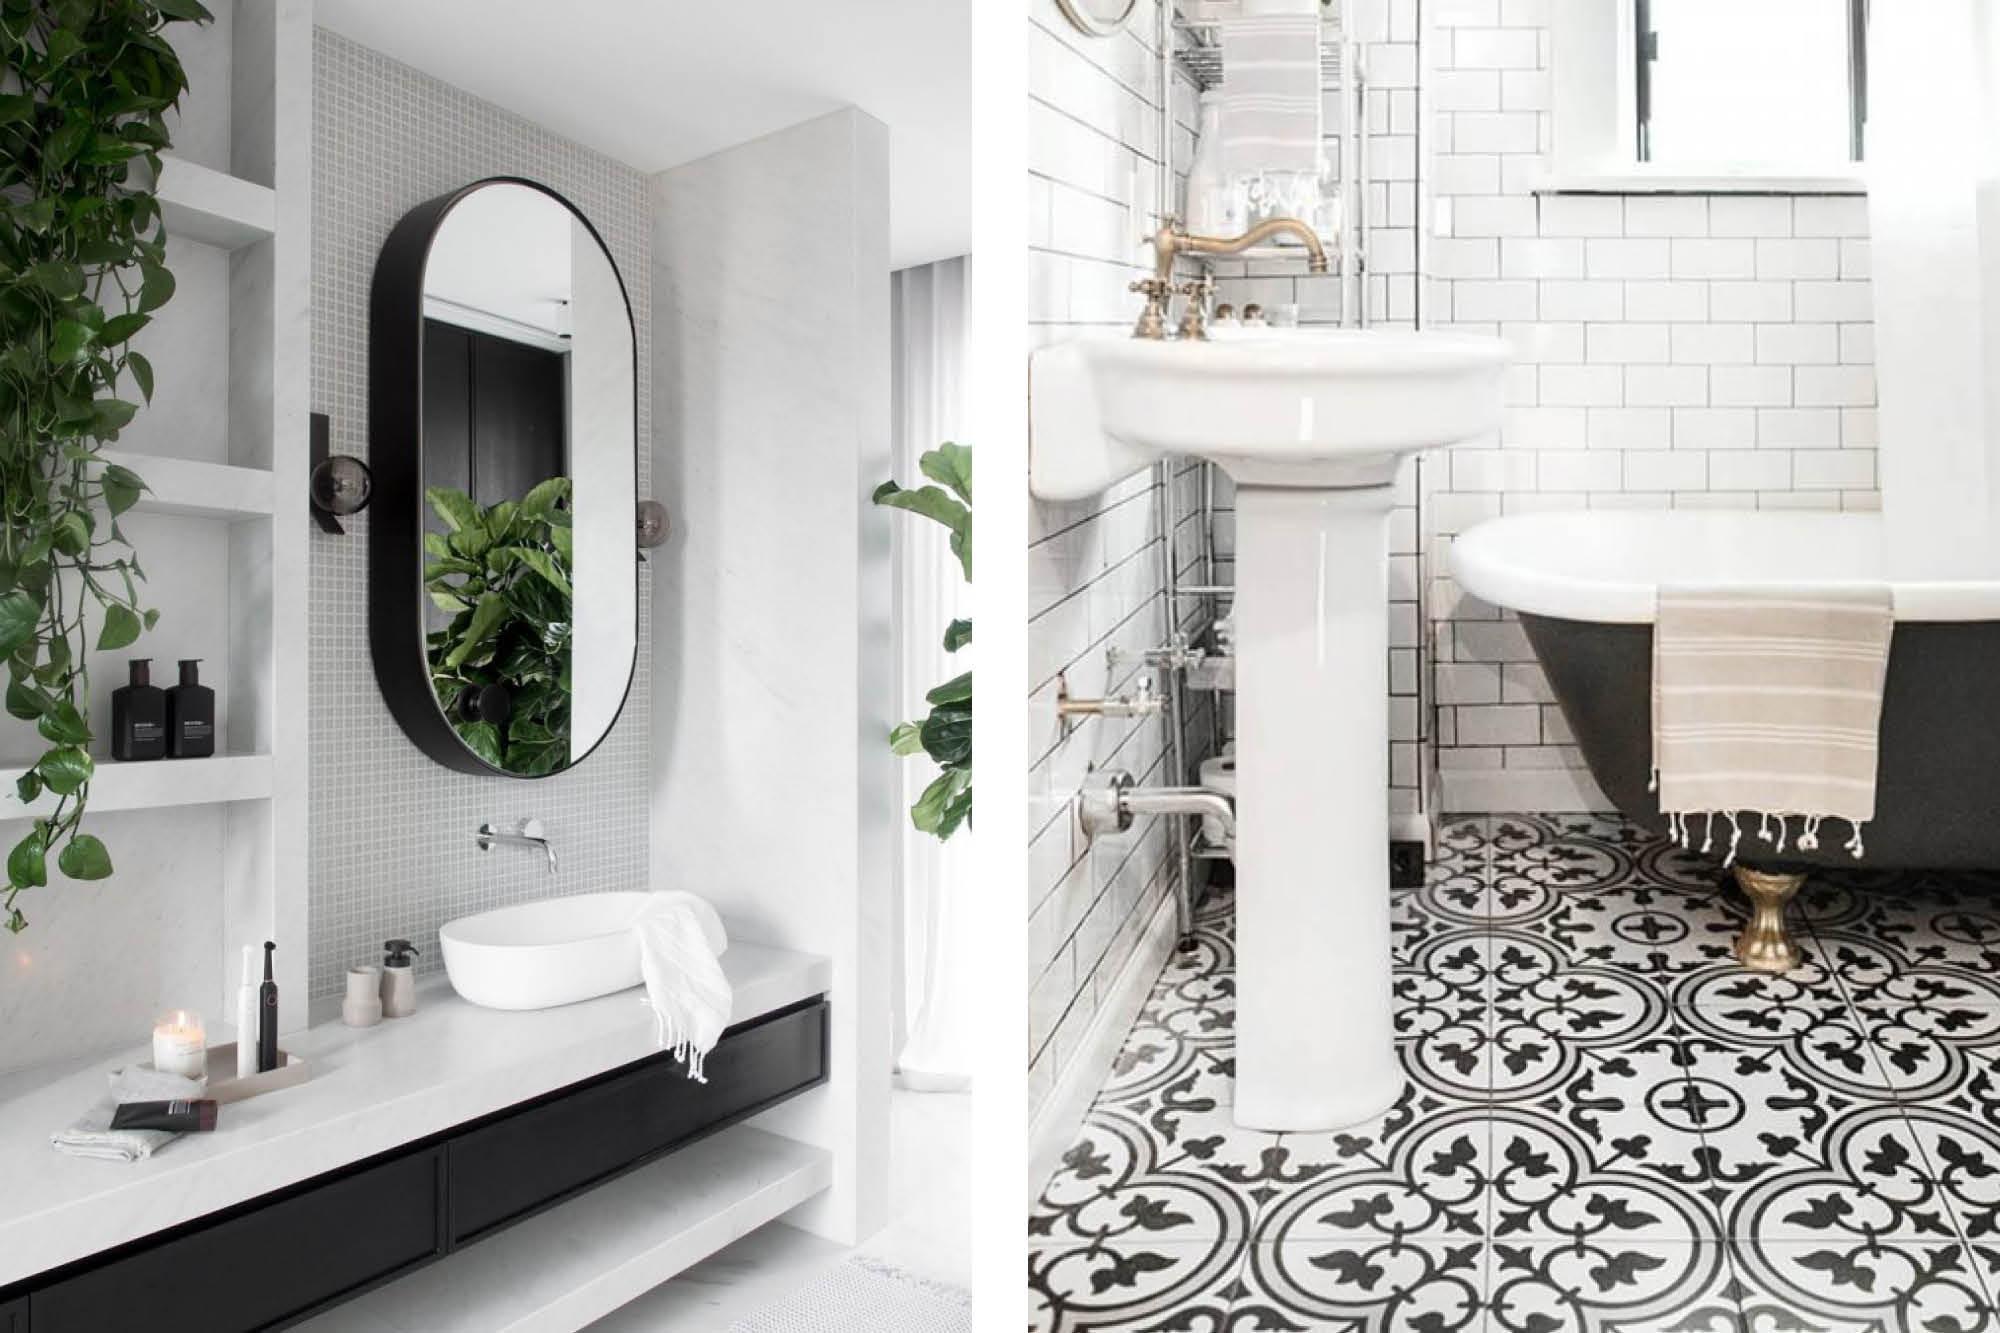 svartvitt-badrum-rena-snitt-klassiskt